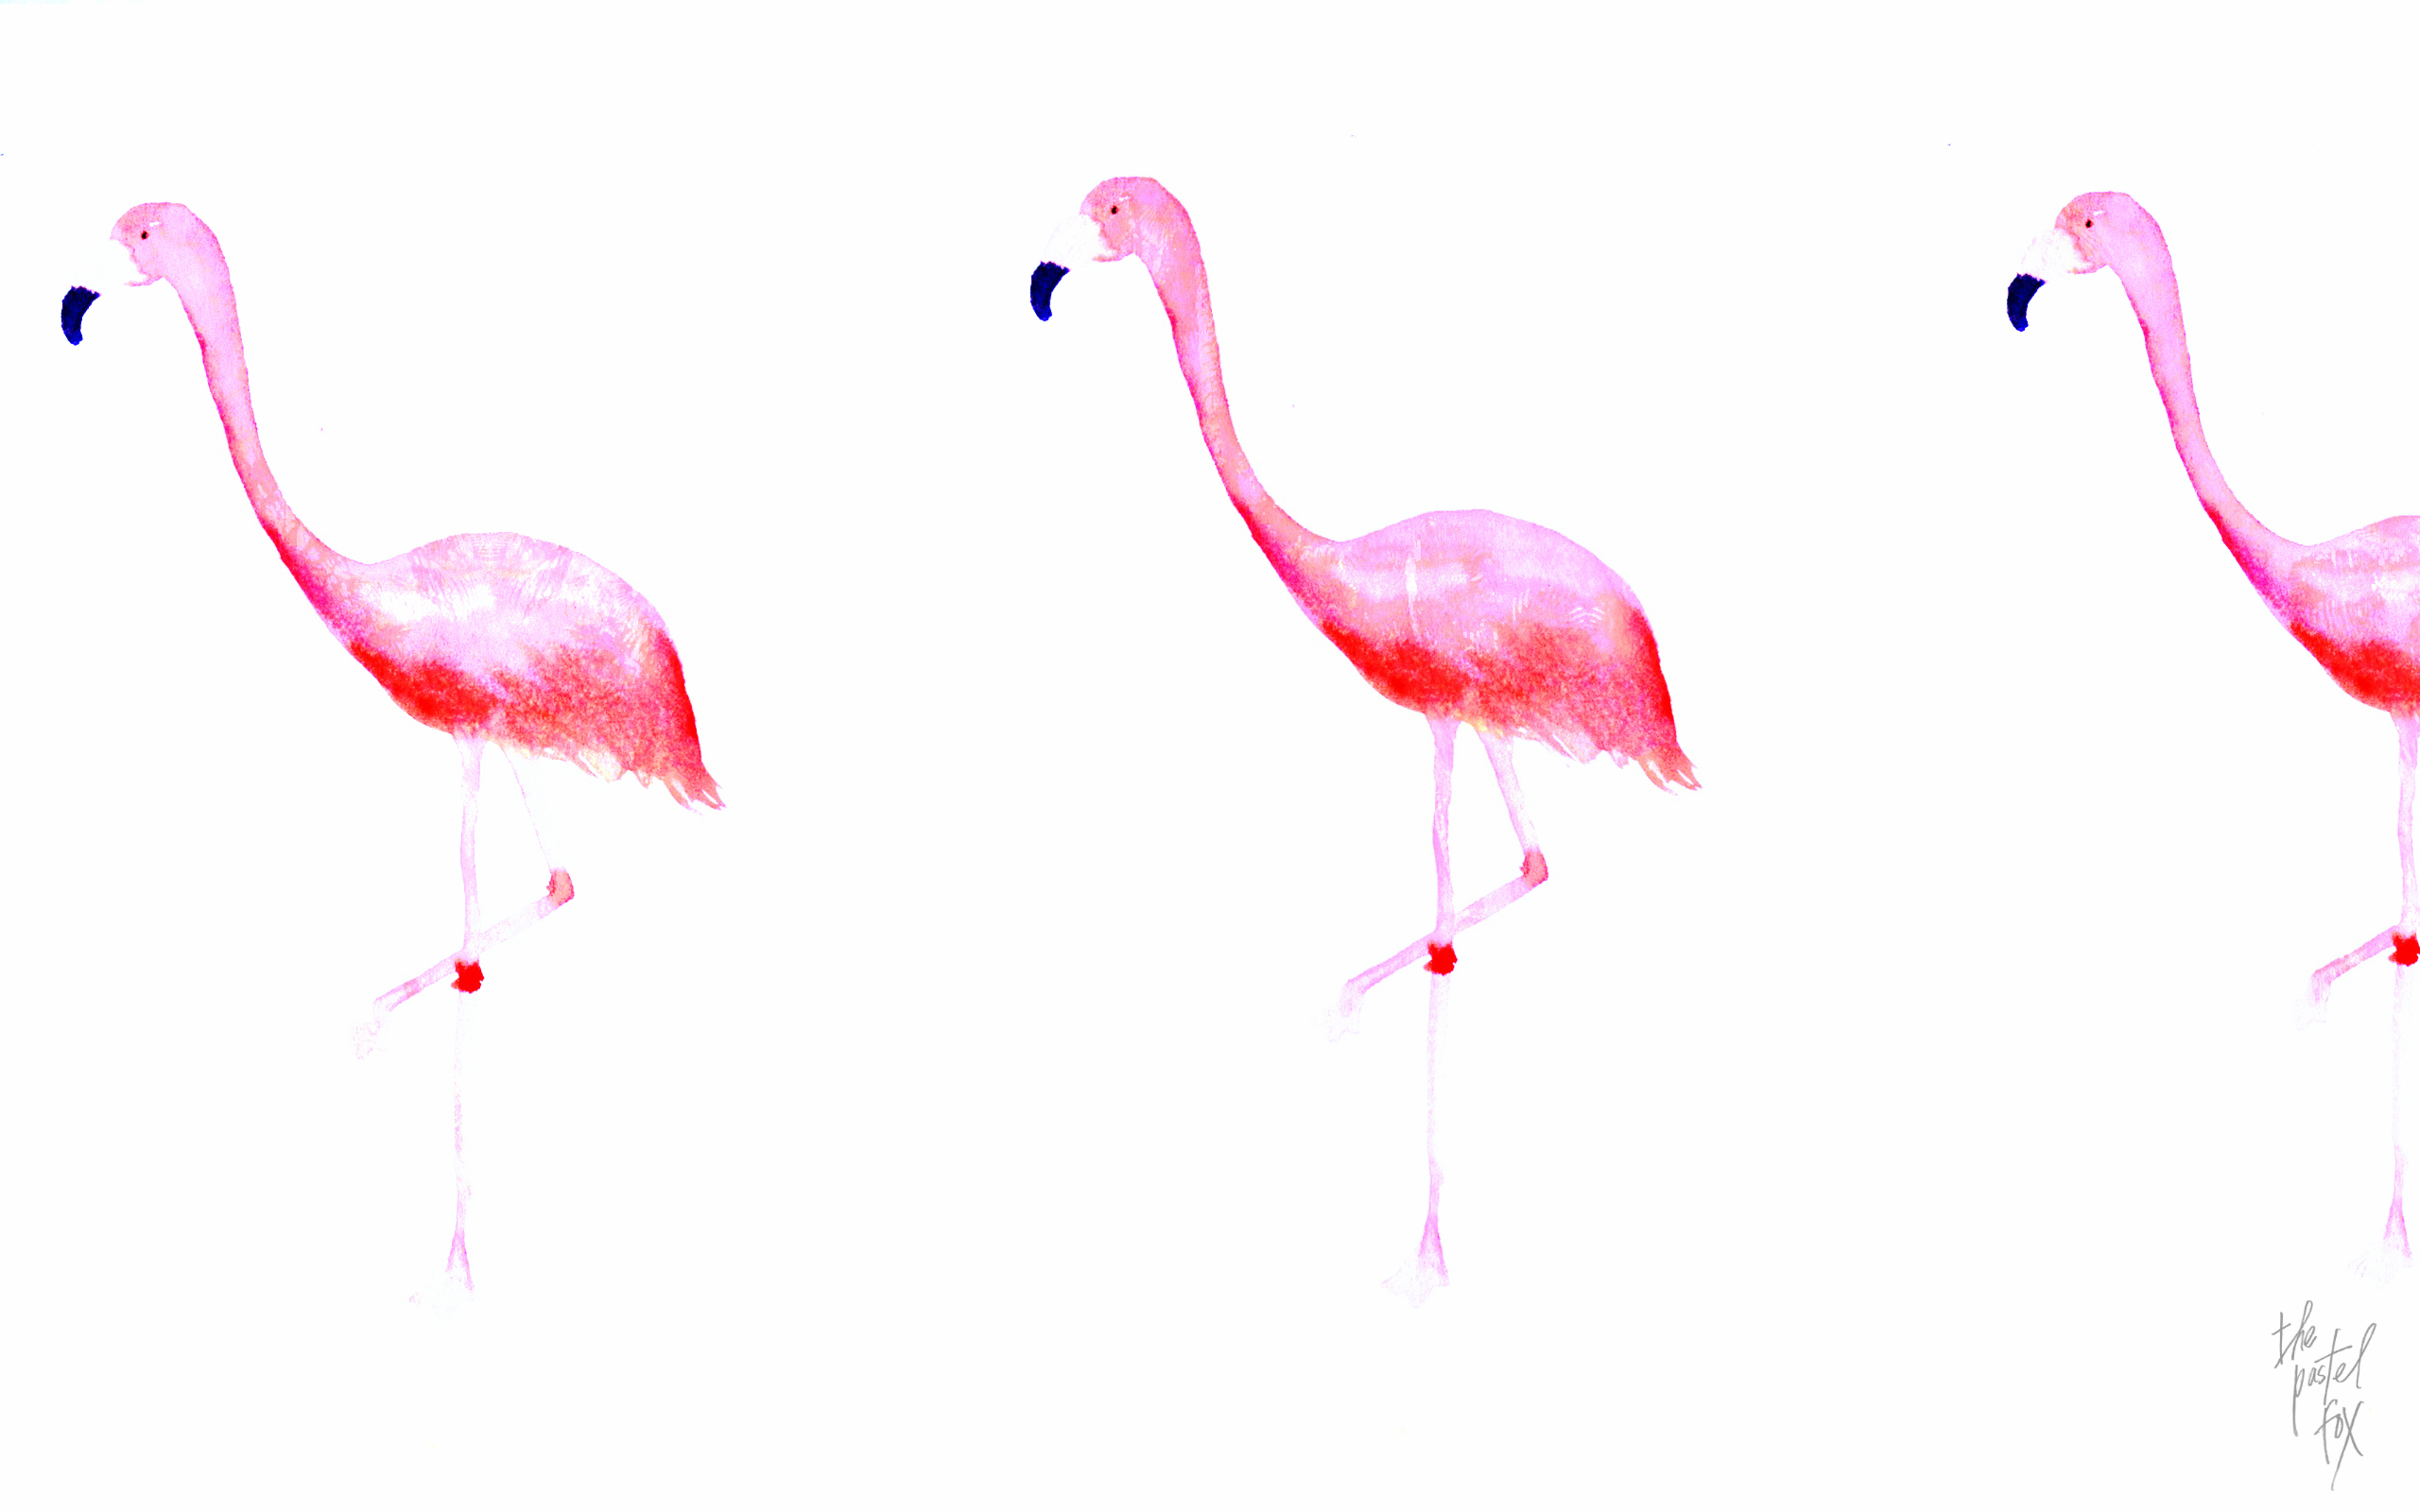 3d Moving Wallpapers For Desktop Free Download Flamingo Wallpapers Hd Pixelstalk Net